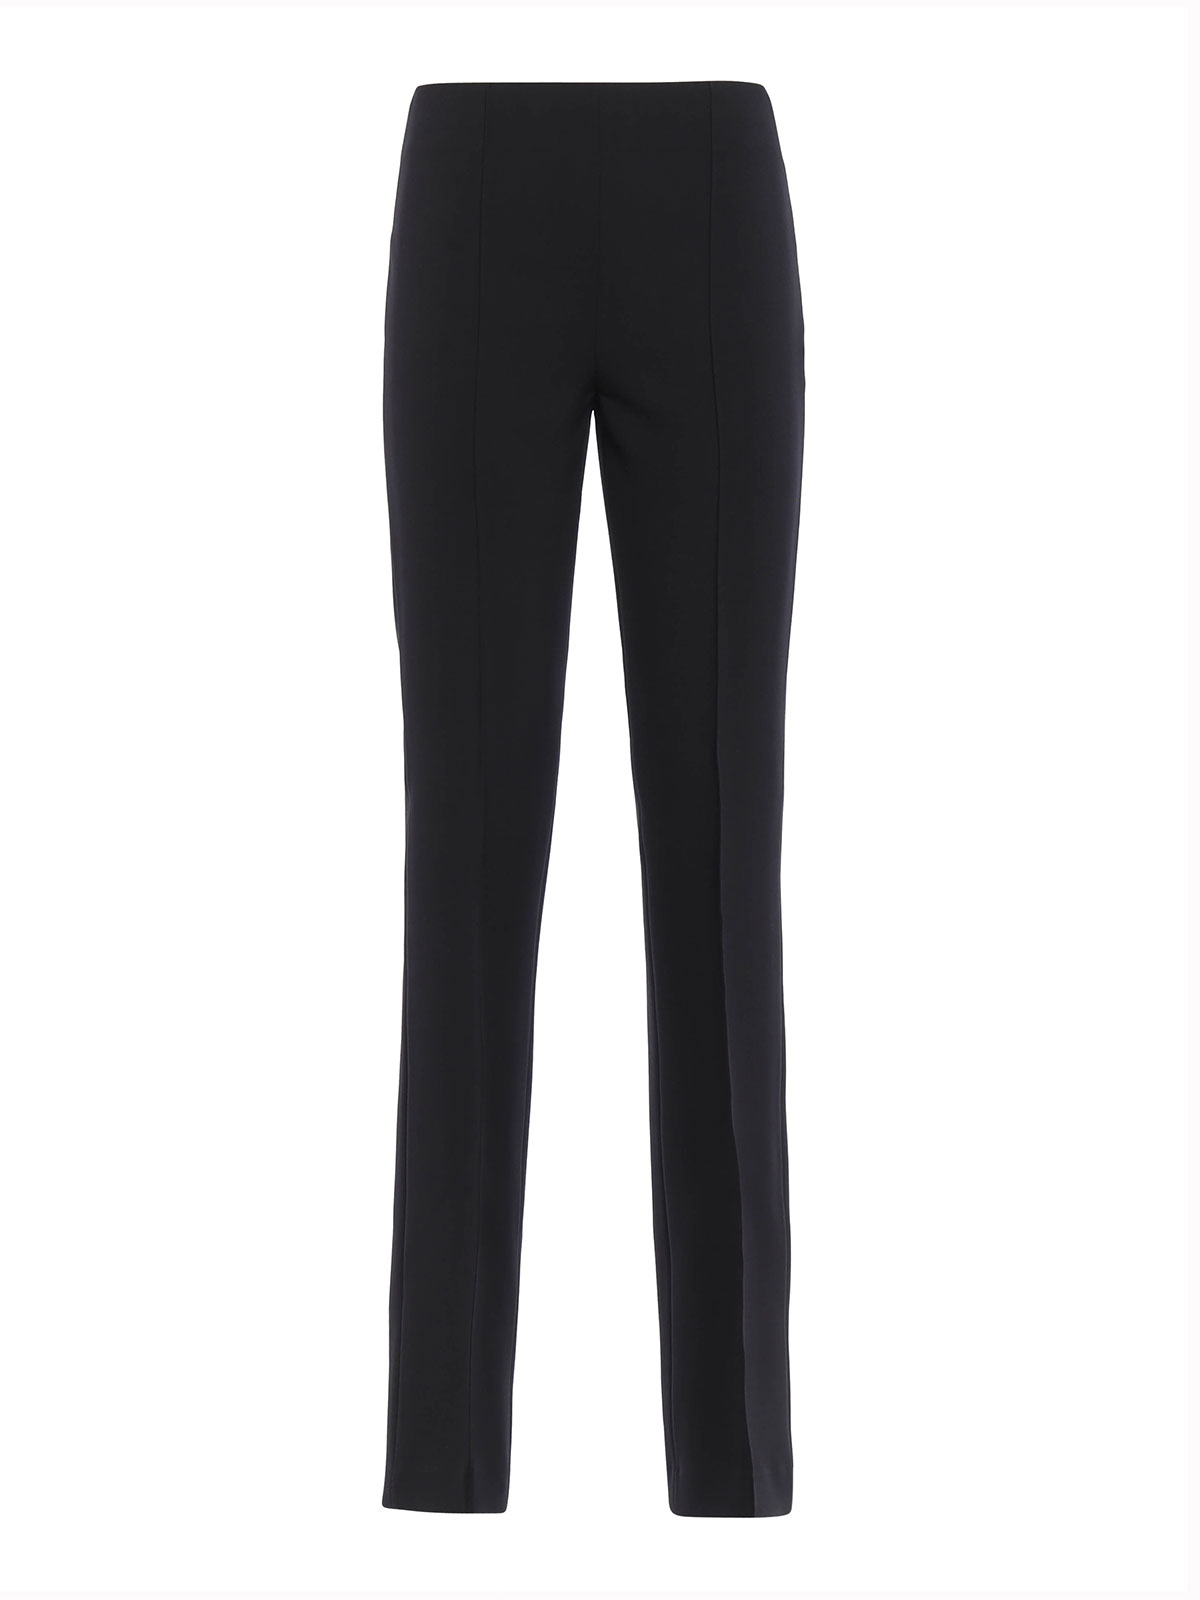 2b9cc5caab BLUMARINE  Pantalones de sastrerìa - Pantalón De Vestir Negro Para Mujer